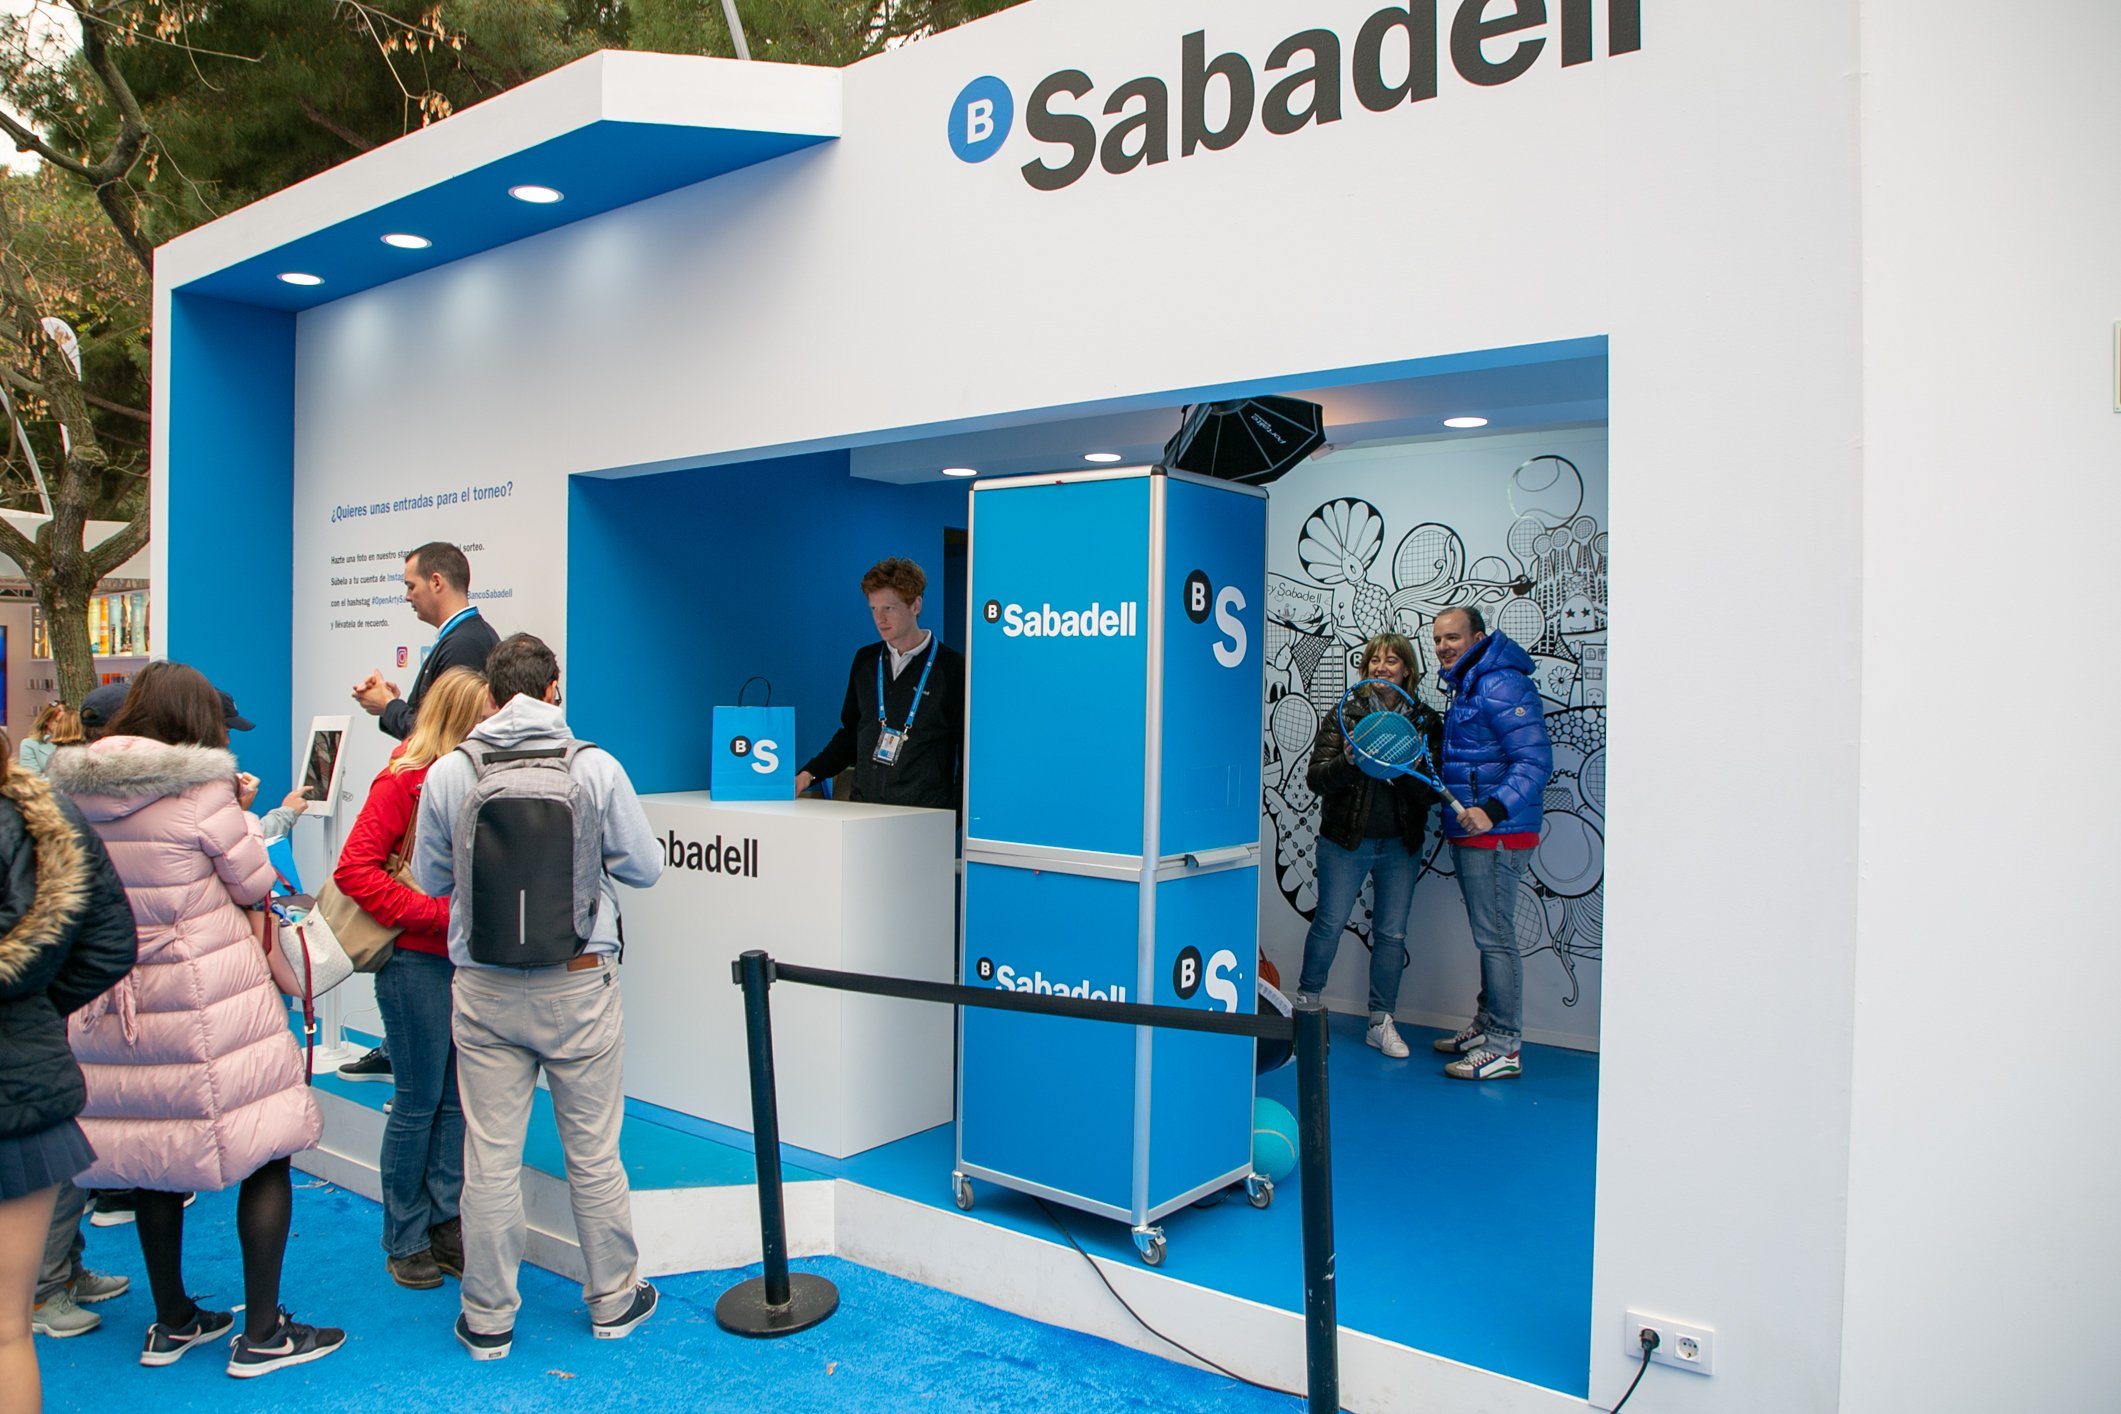 Mural Yoshi Barcelona Open Banc Sabadell 2019